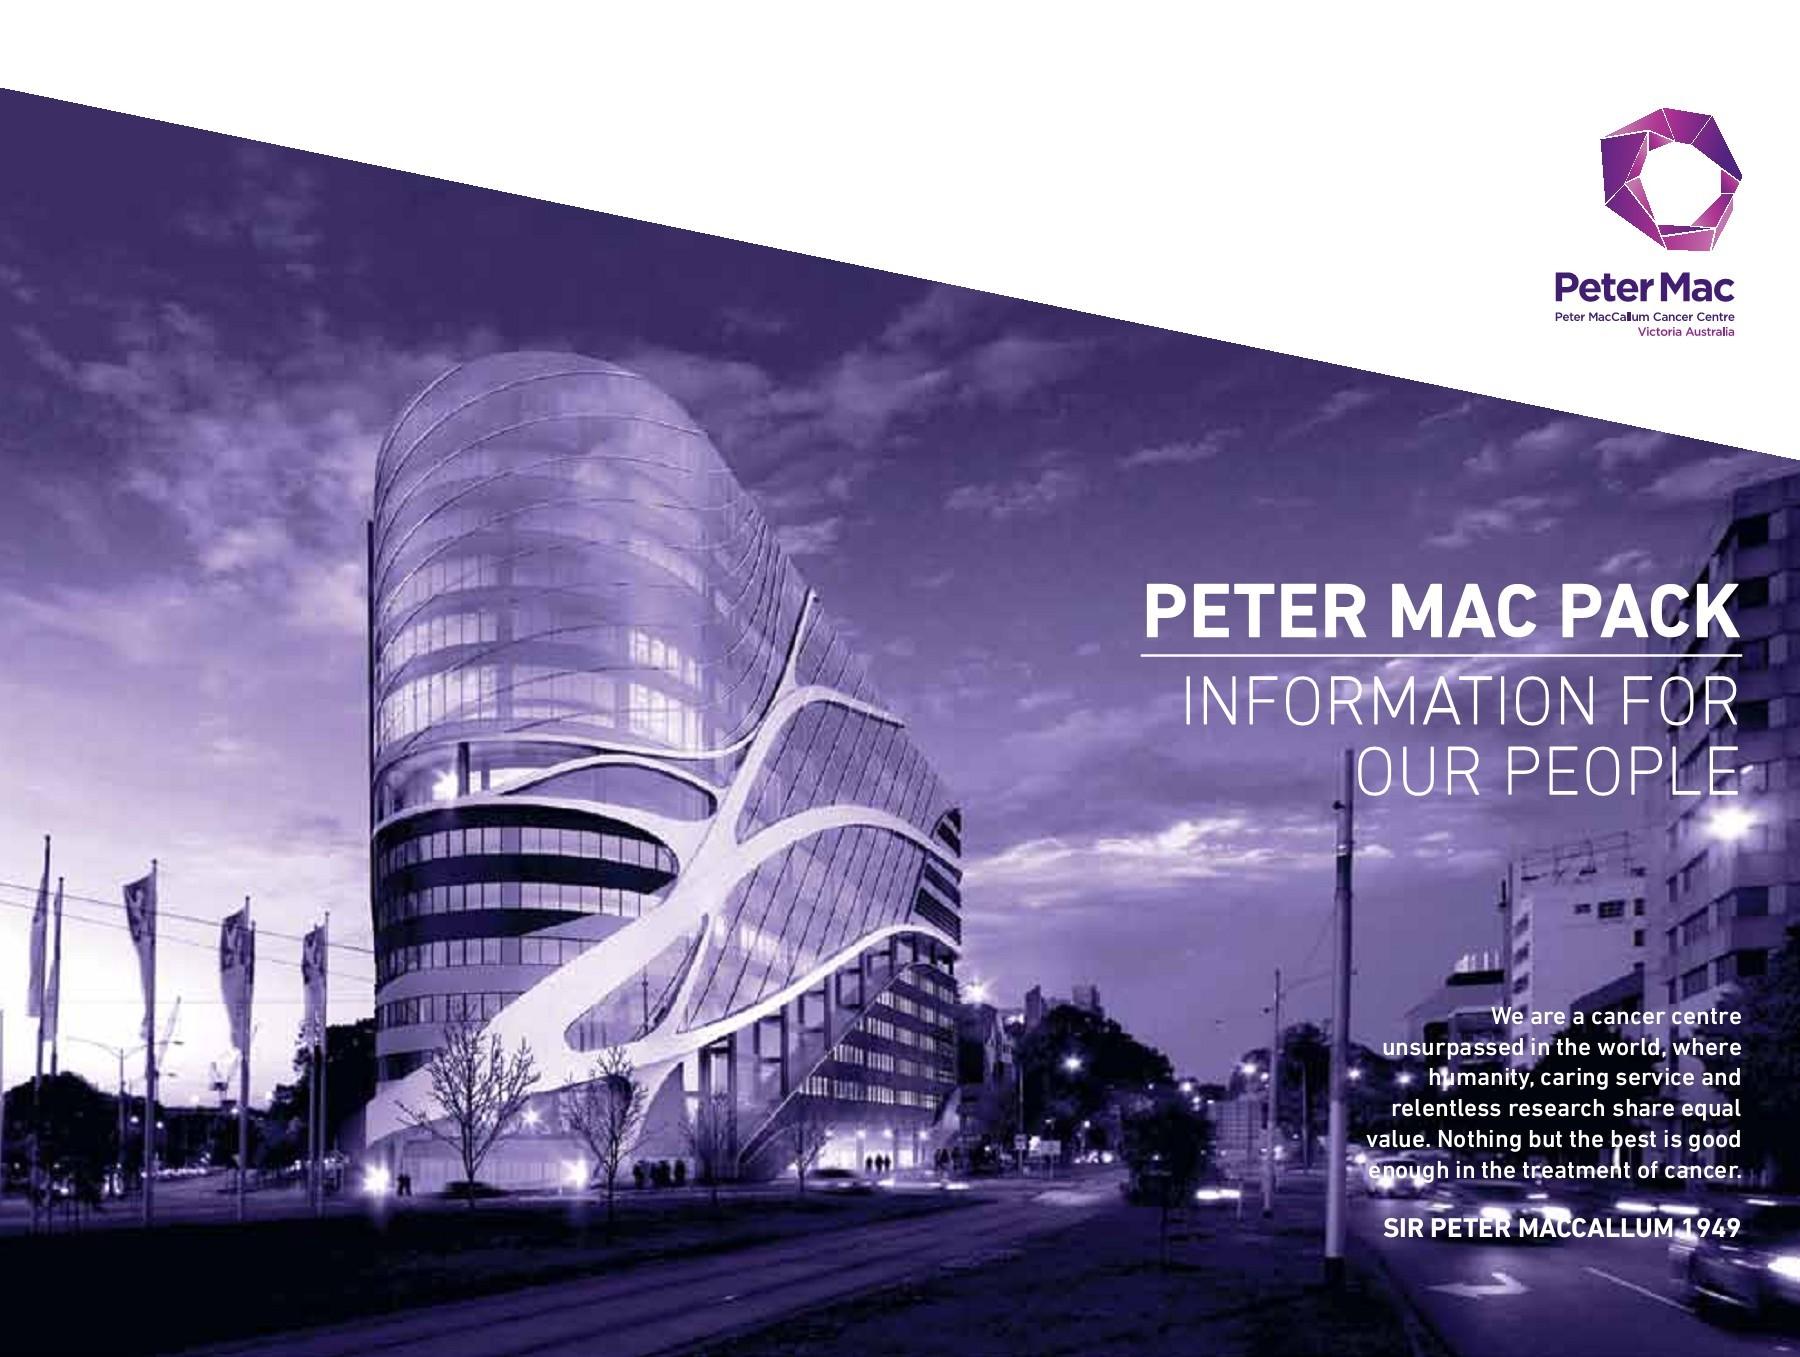 familial cancer centre peter mac)